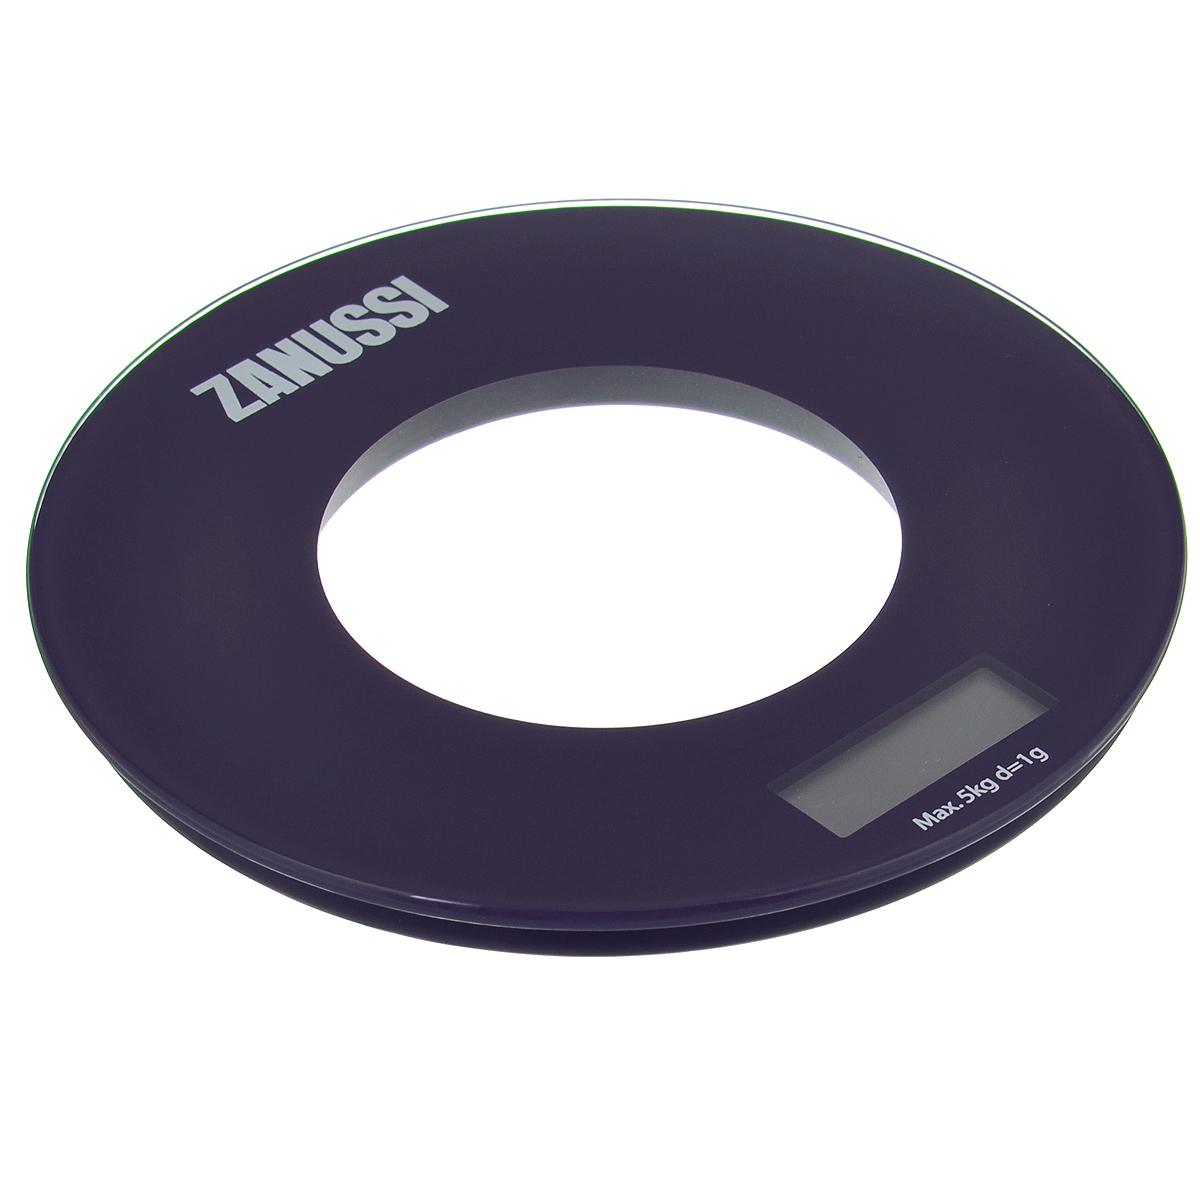 "Весы кухонные Zanussi ""Bologna"", электронные, цвет: фиолетовый, до 5 кг ZSE21221BF"